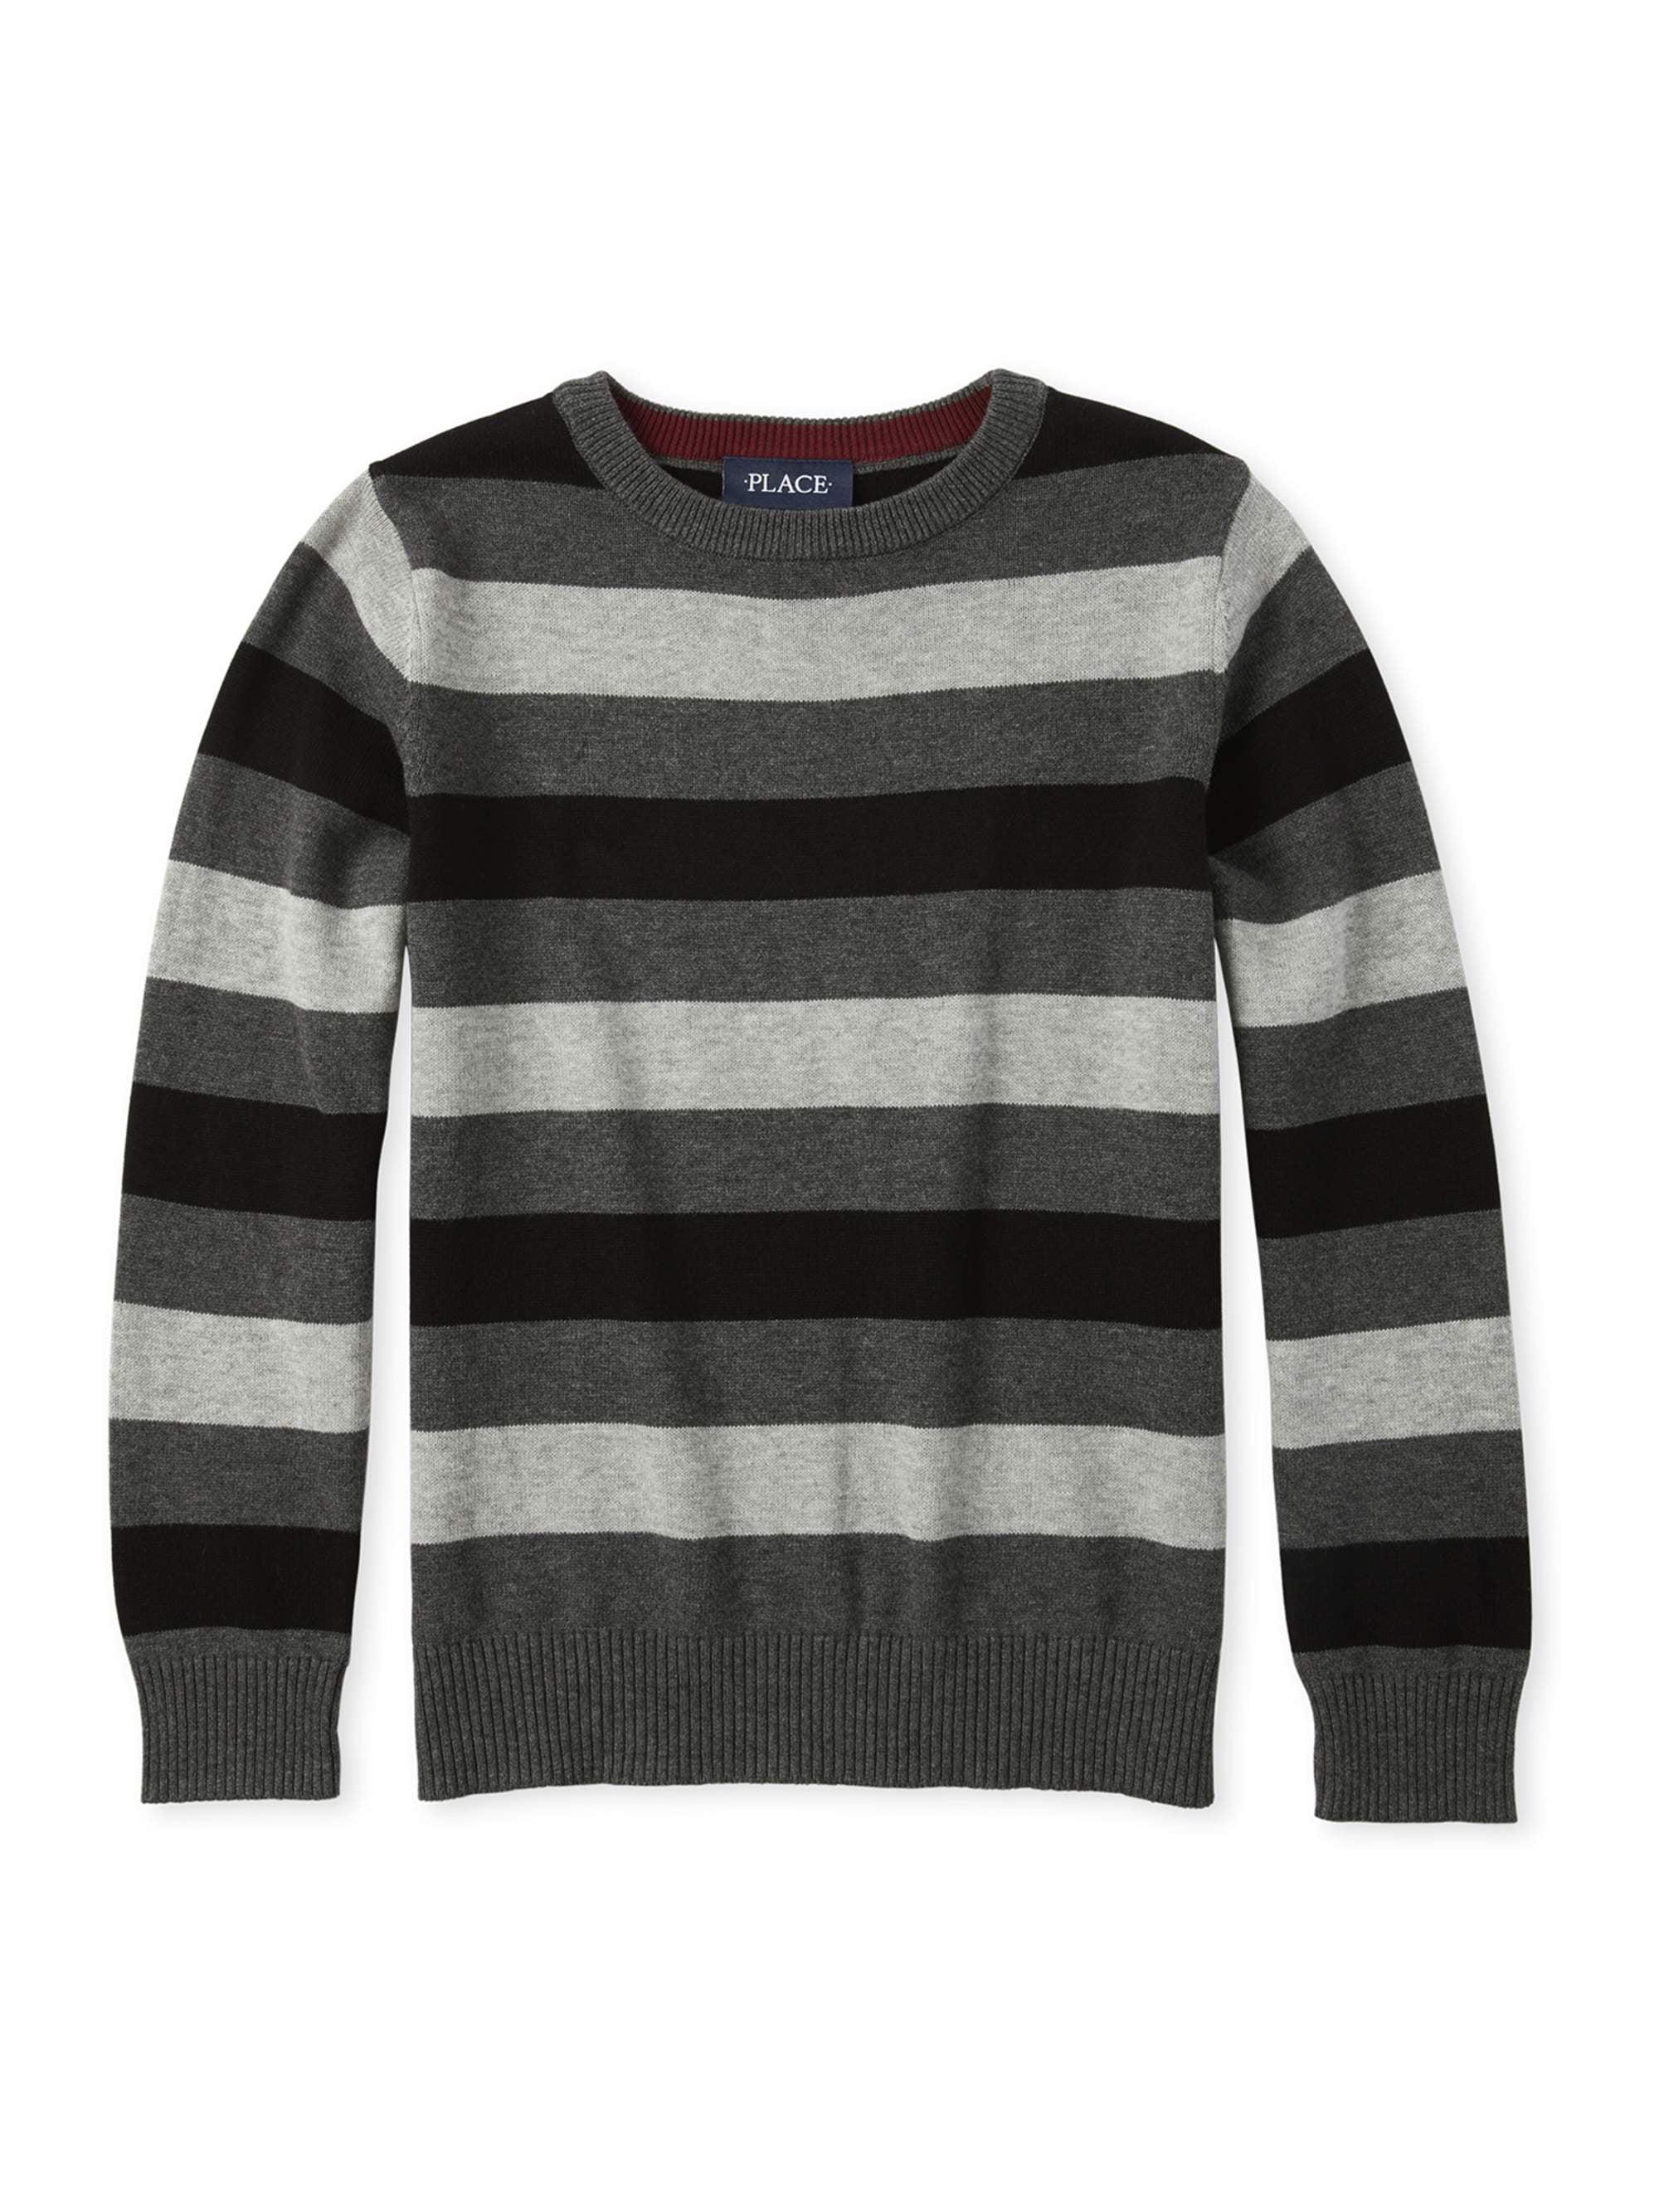 Boys striped sweater